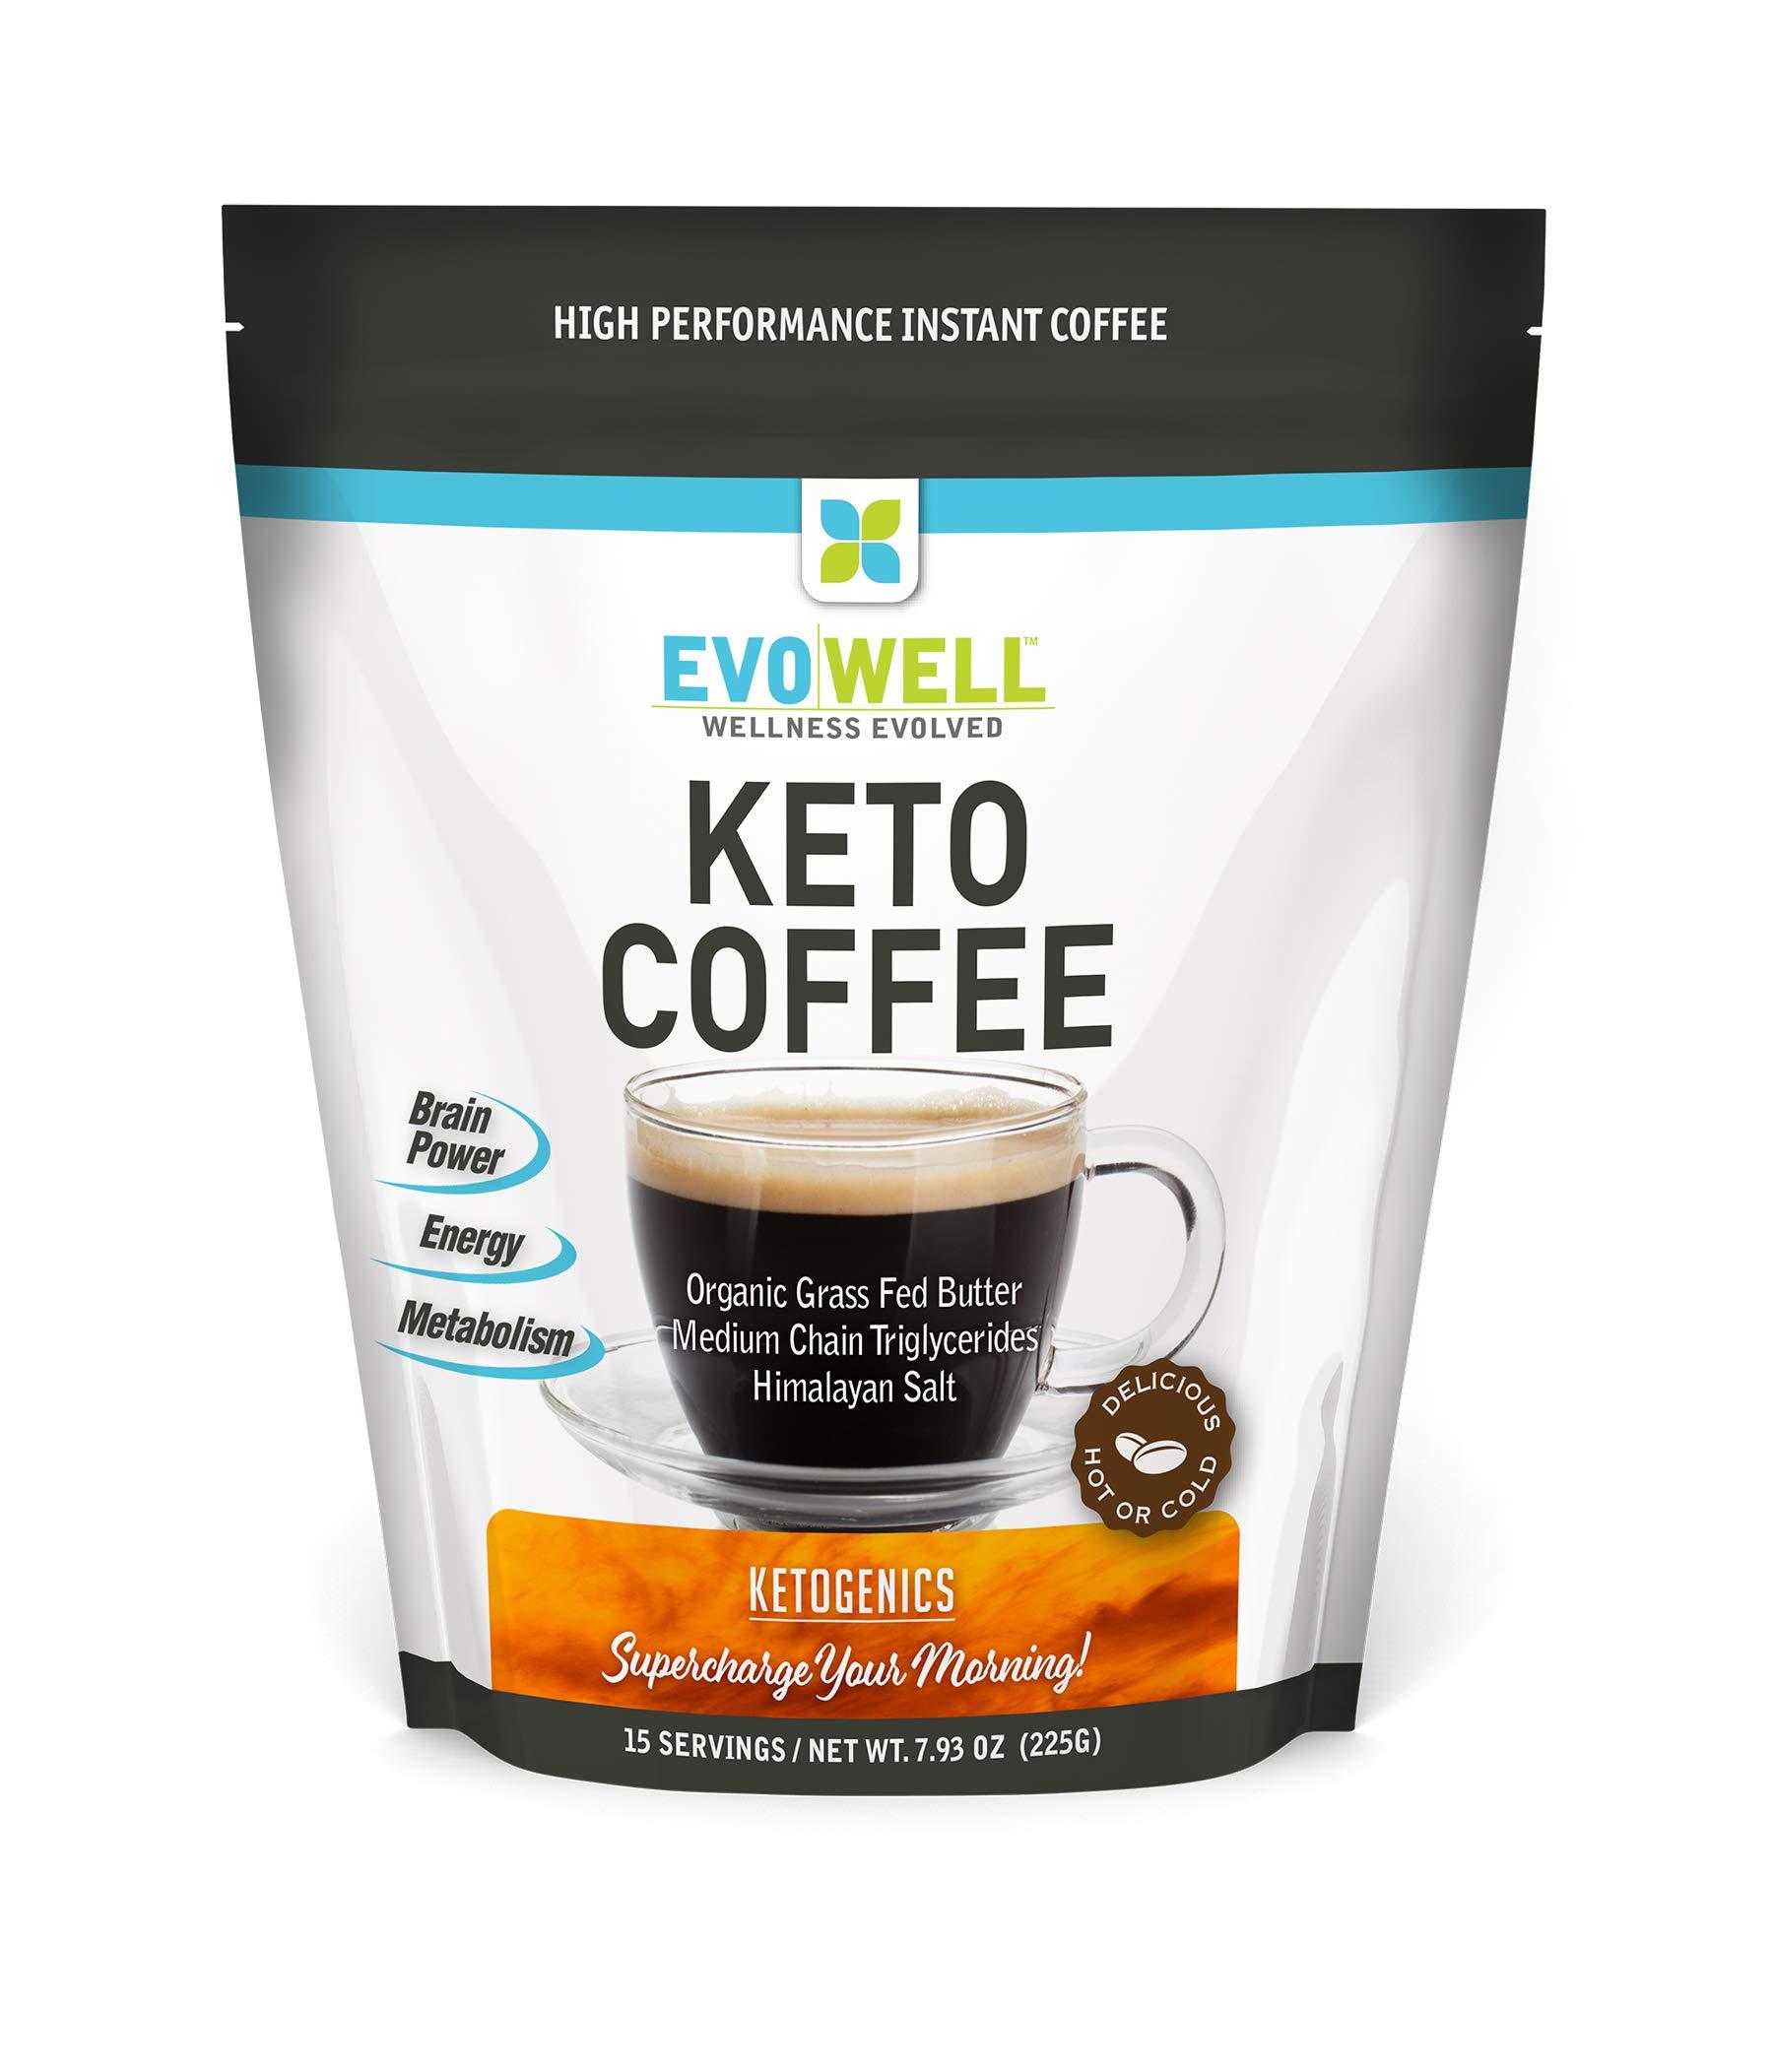 EVOWELL Keto Brown Coffee, Organic Grass Fed Butter, Medium Chain Triglycerides, Himalayan Salt, 15 Servings